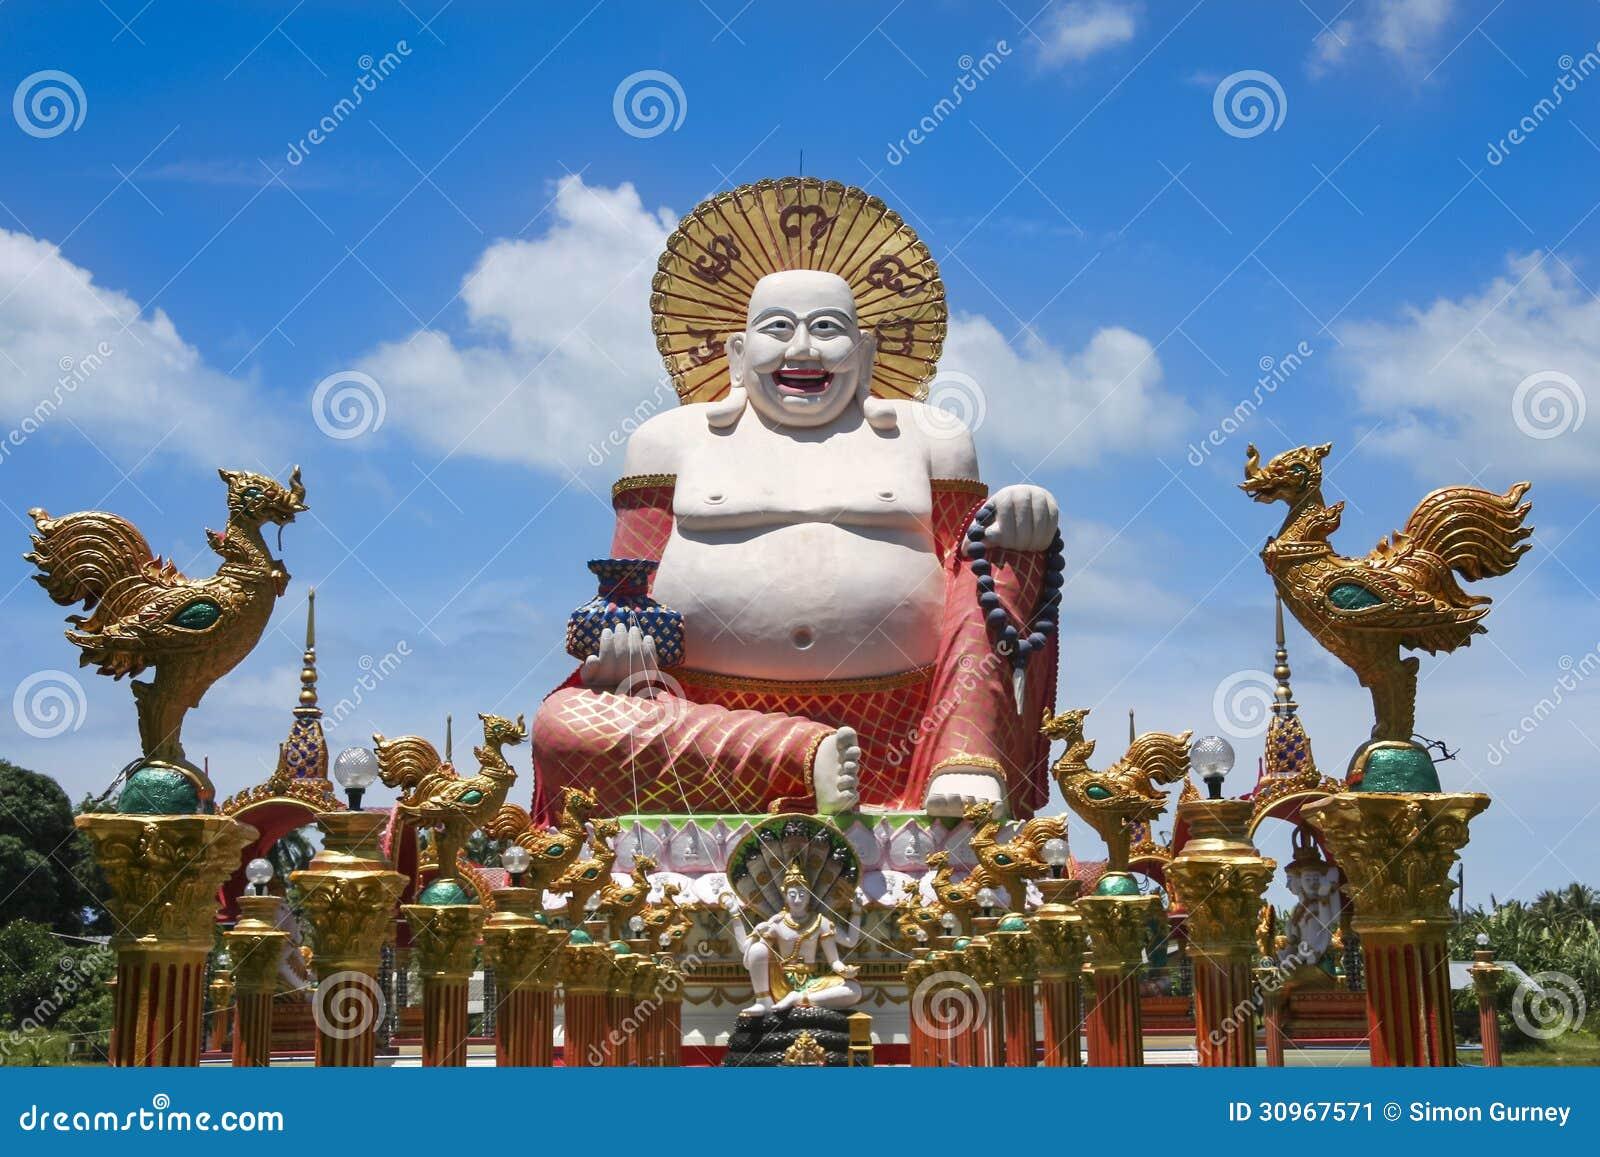 koh samui buddhist singles Asia - single traveler in thailand: krabi or koh samui - i'm a 27-year-old guy traveling to thailand alone for twelve days in january i'm (912082) single traveler in thailand: krabi or koh.